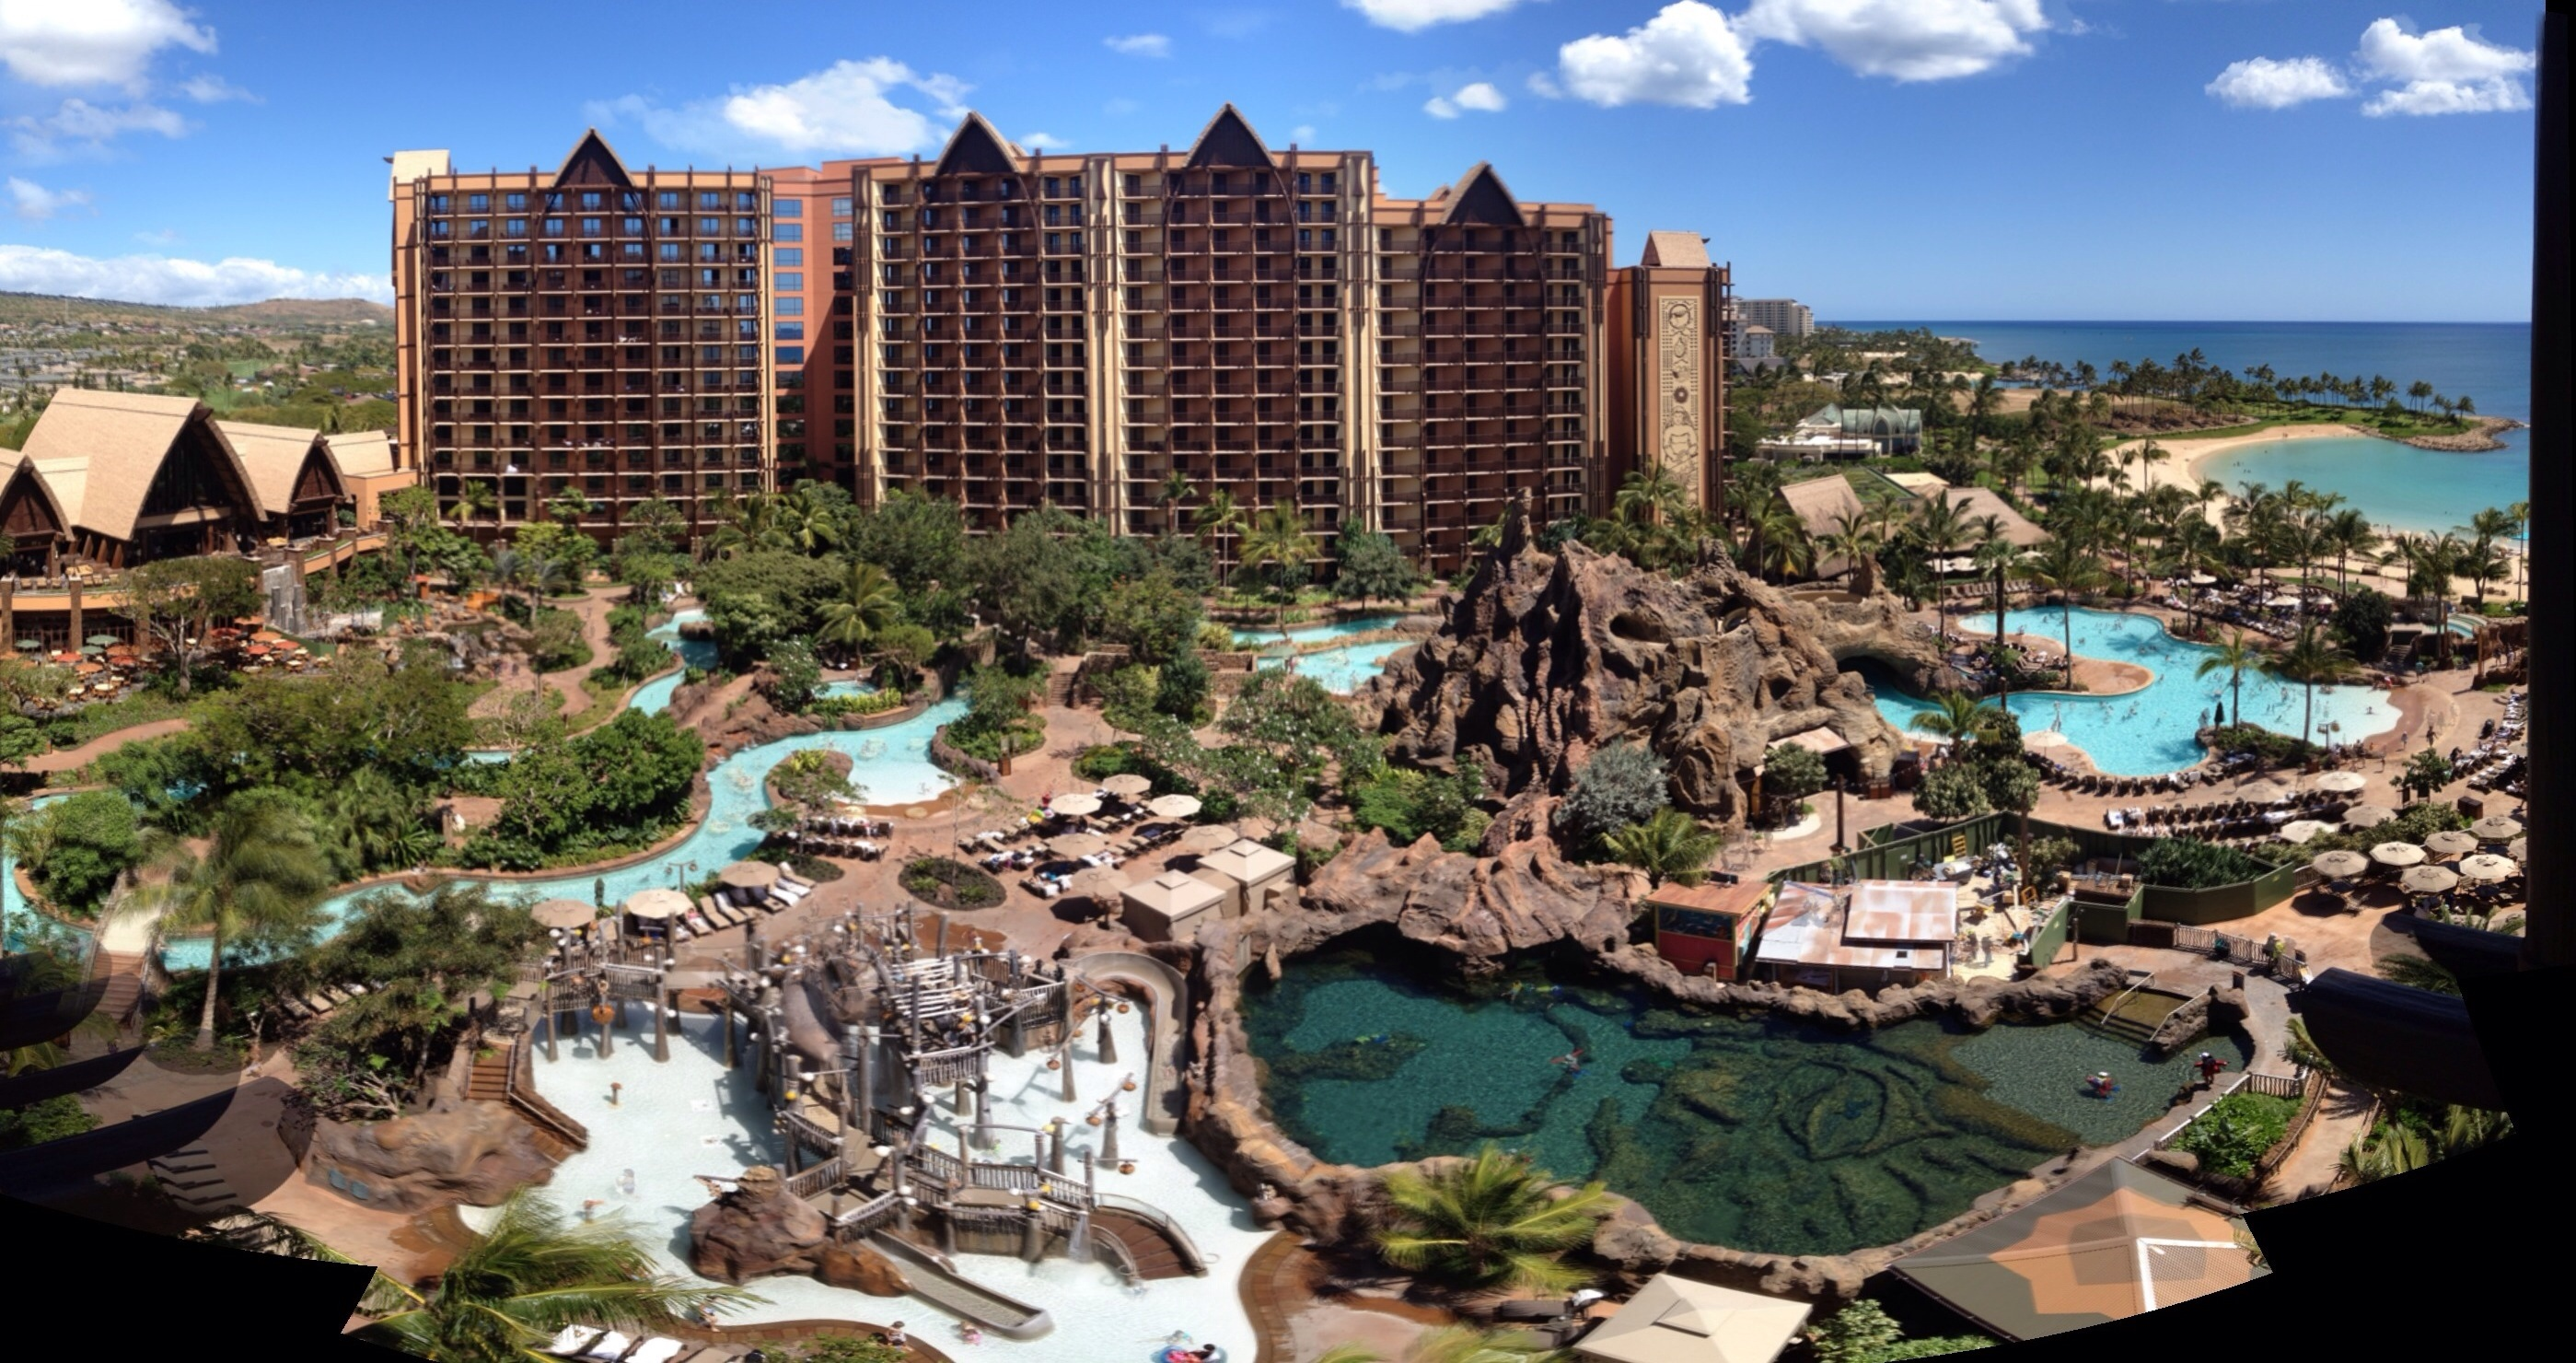 Aulani, Disney Vacation Club Villas Overview